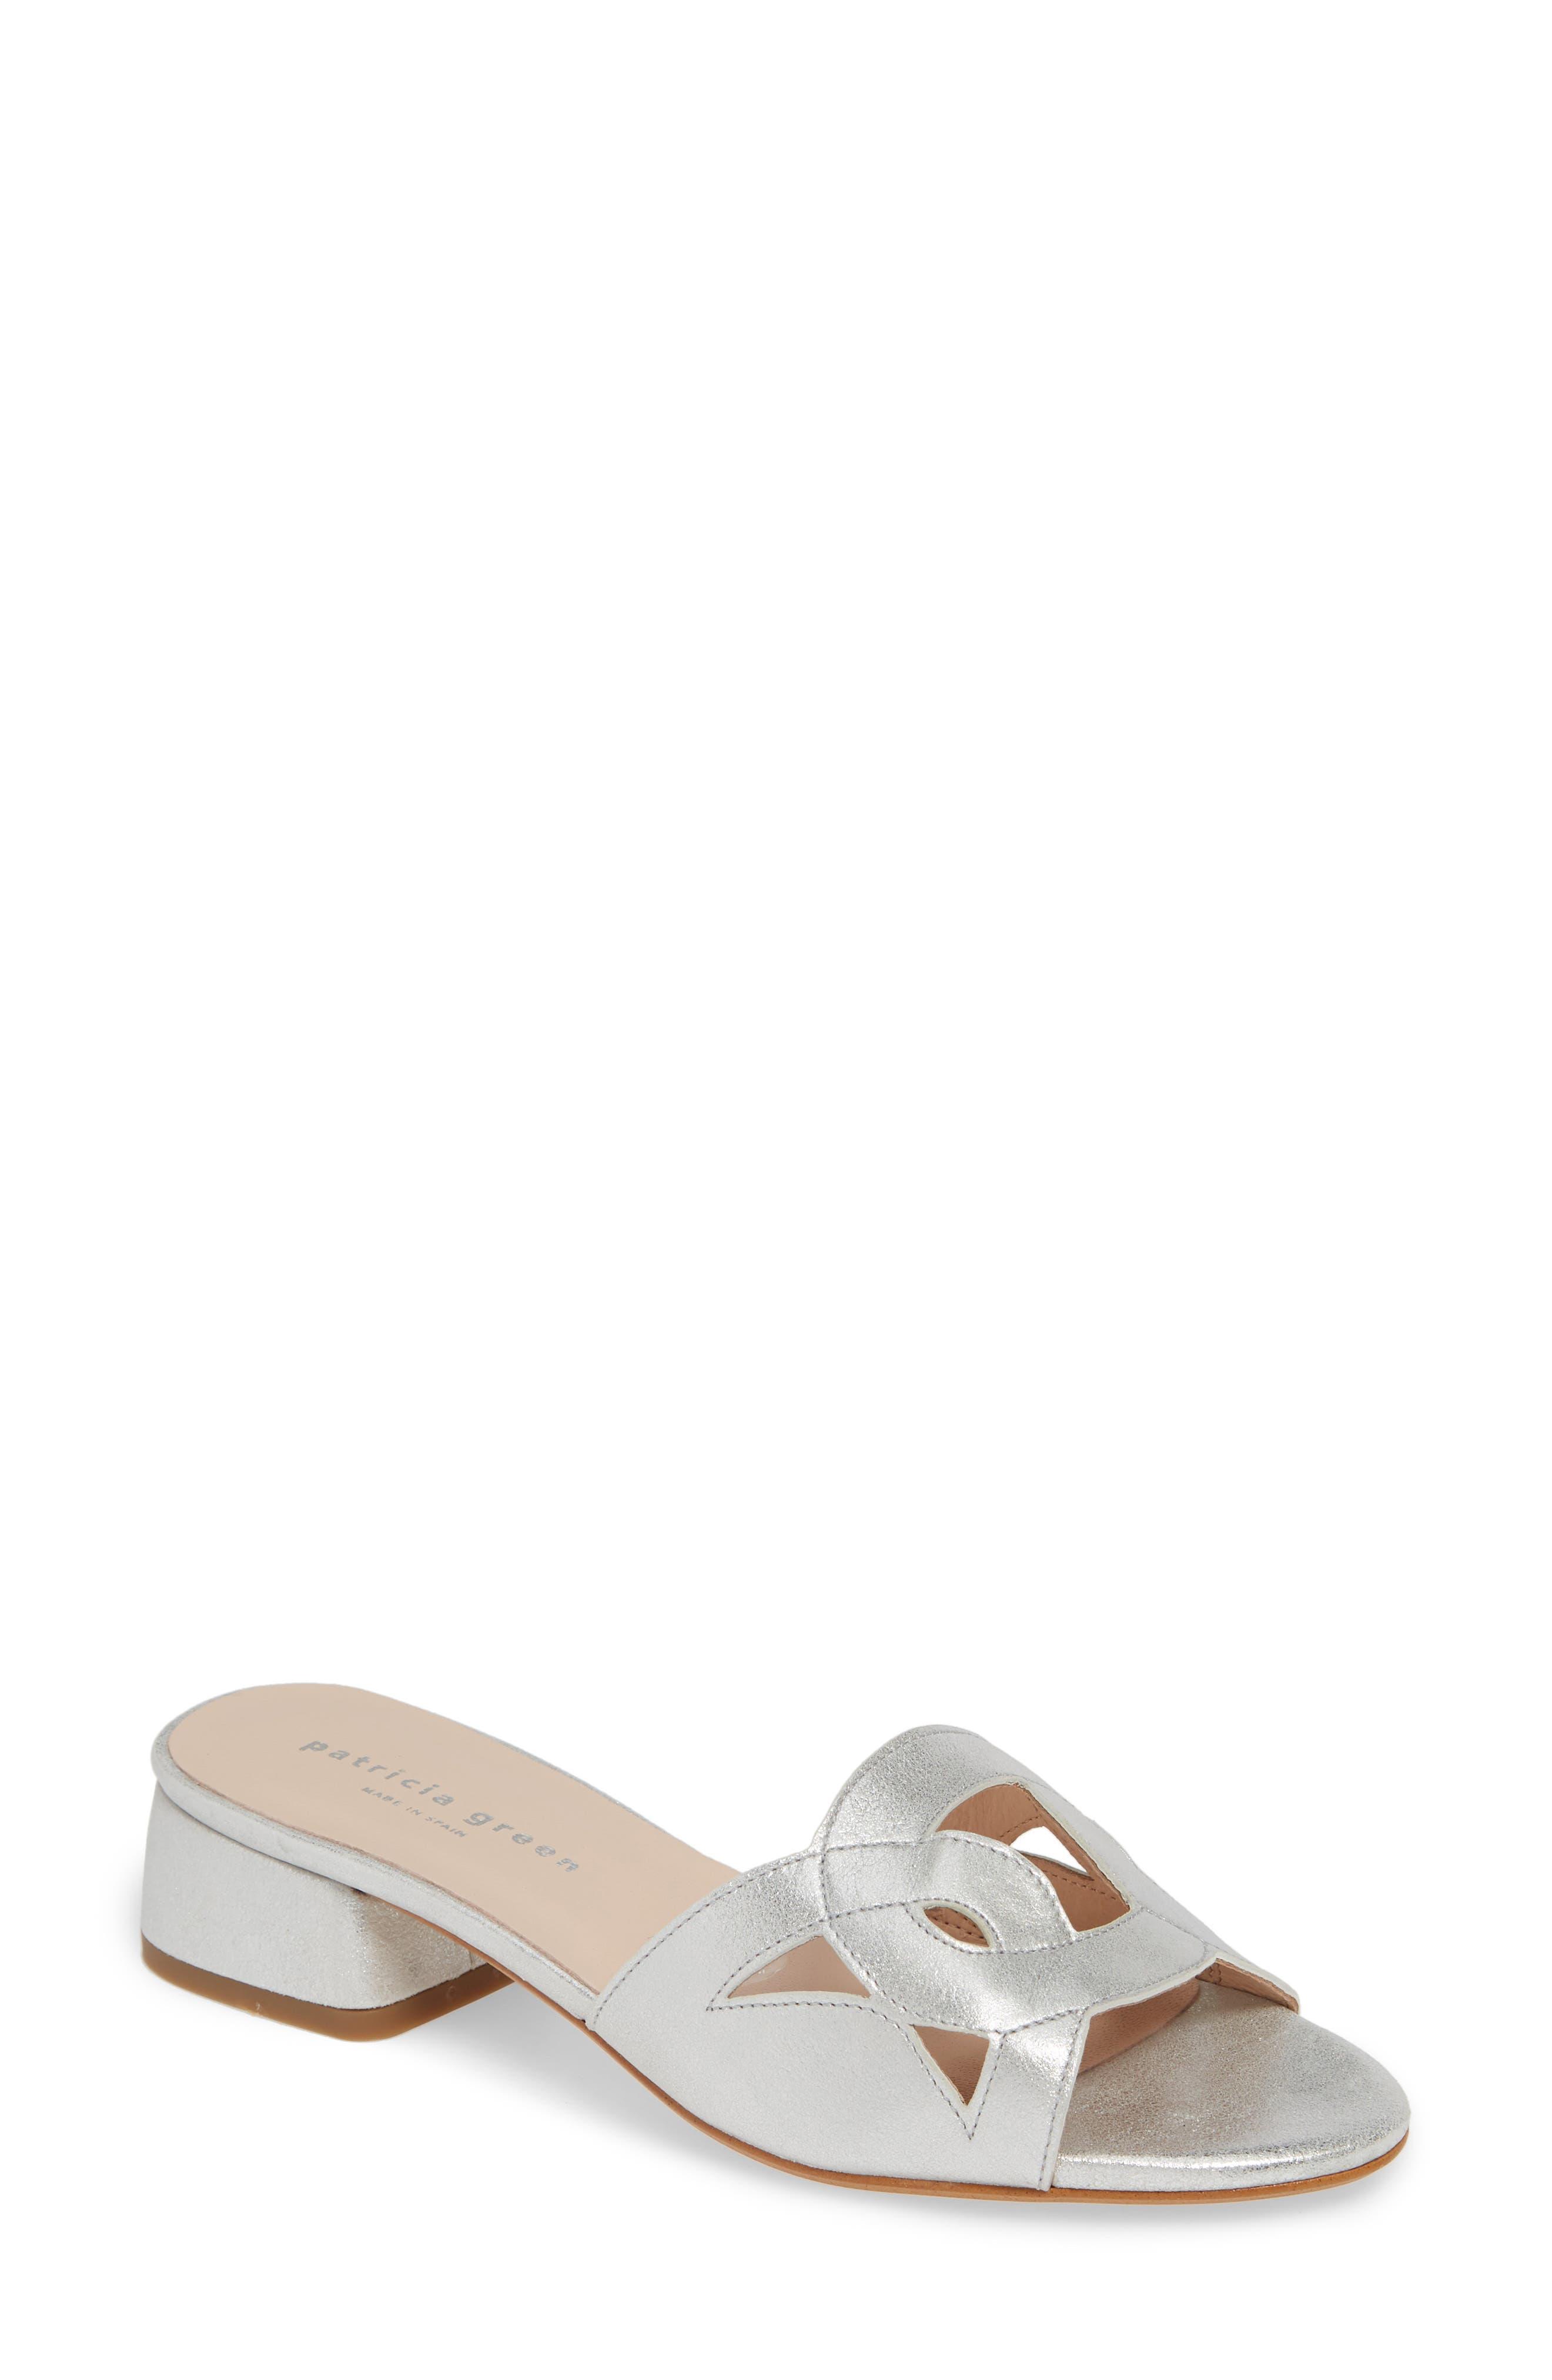 Patricia Green Boca Slide Sandal- Metallic